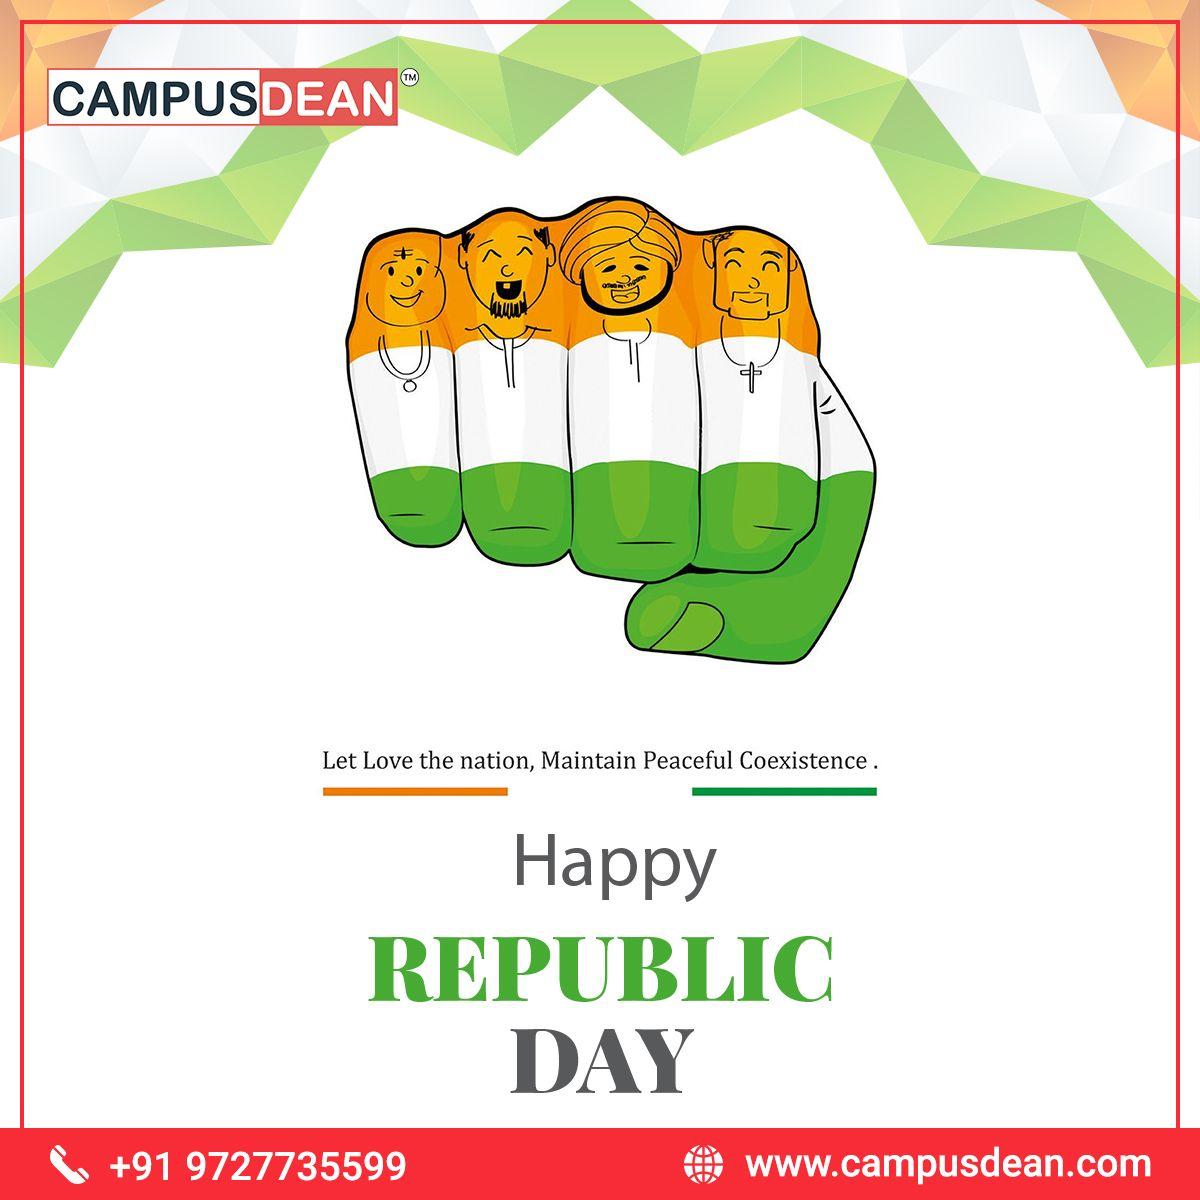 Happy Republic Day 2021 In 2021 Republic Day Republic Day India Republic Happy republic day 2021 images best